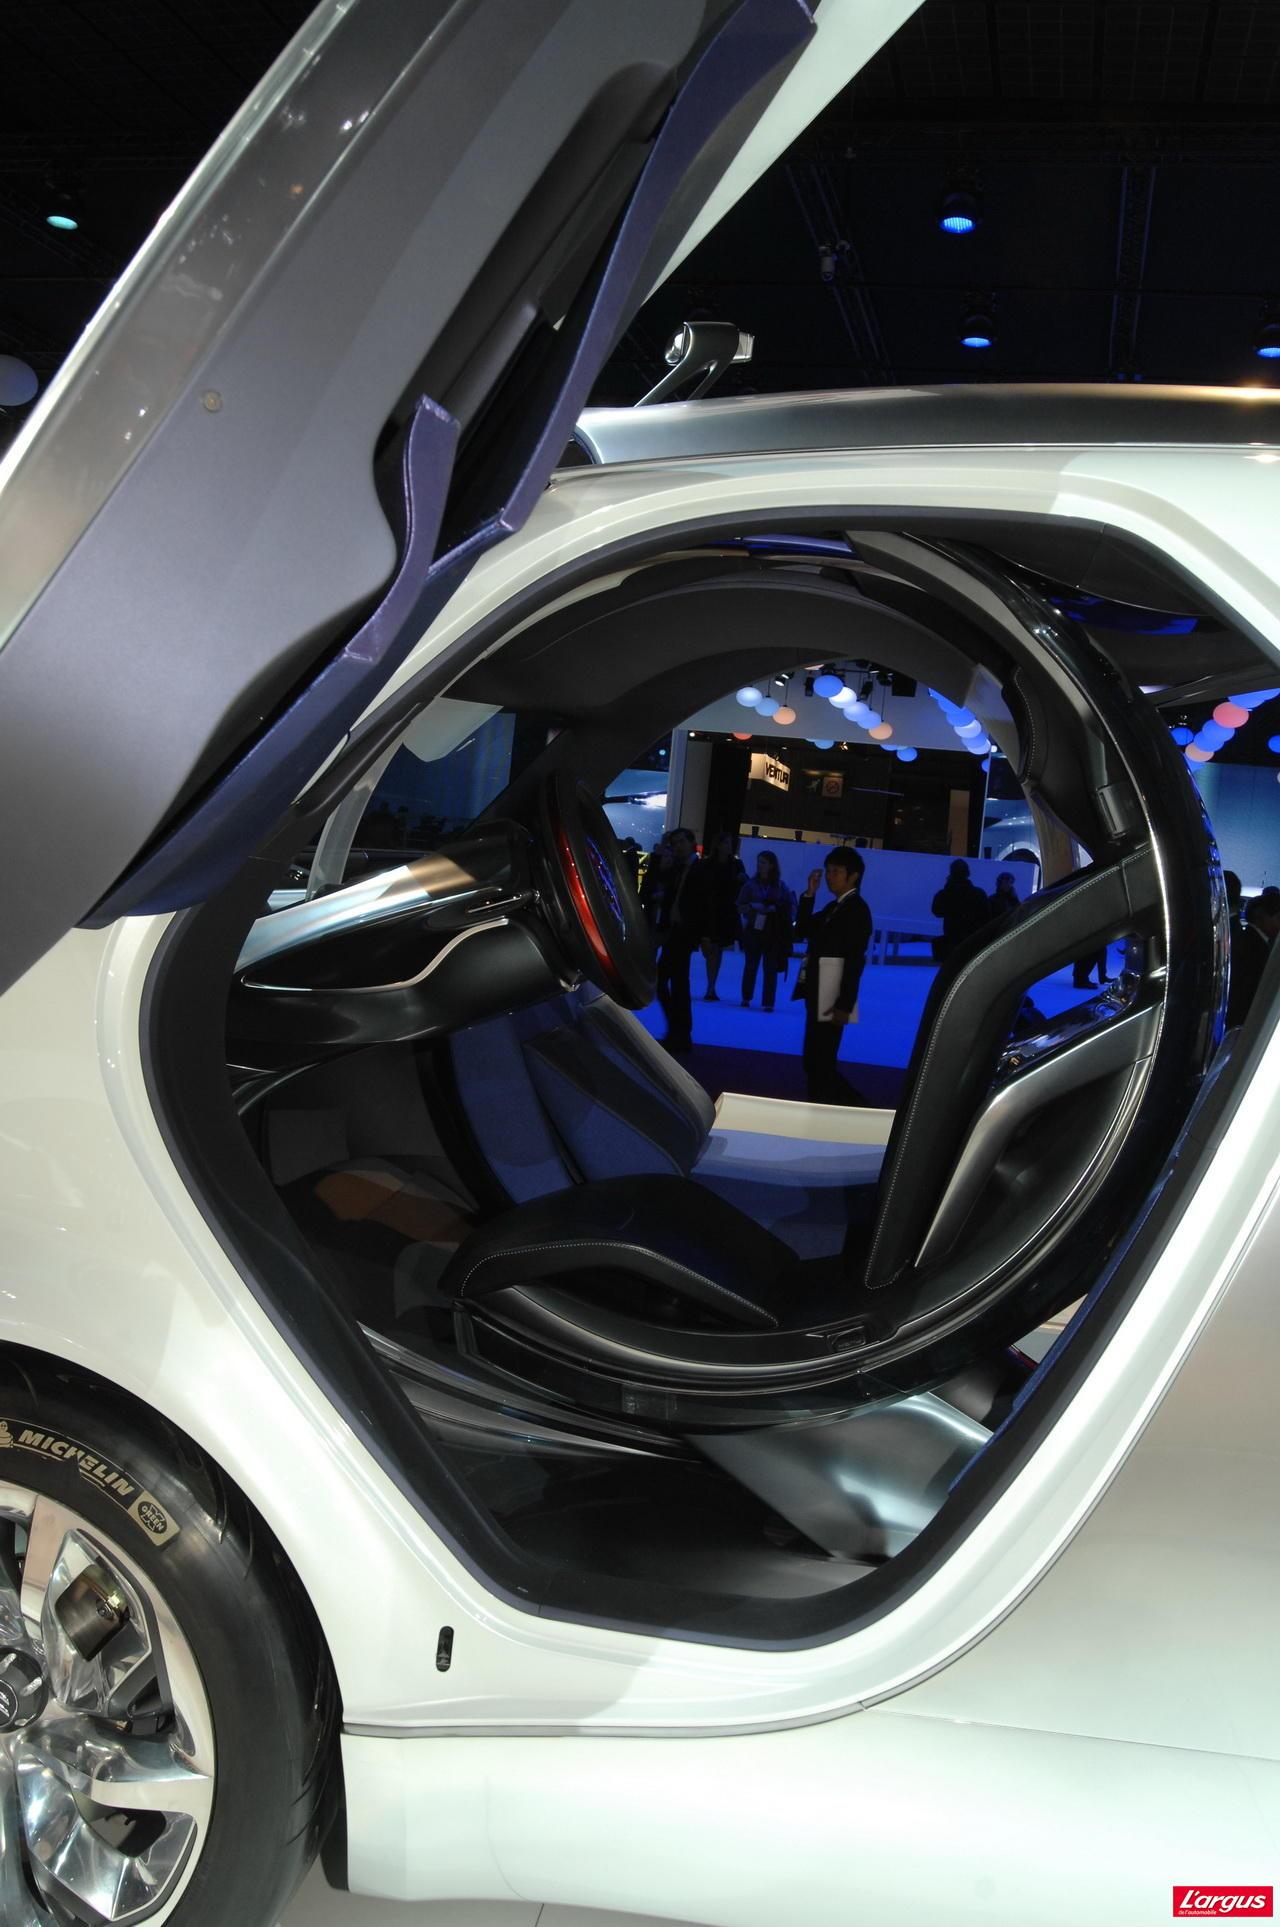 Citroen Tubik - Un combi façon Citroën - Mondial de l'auto ...